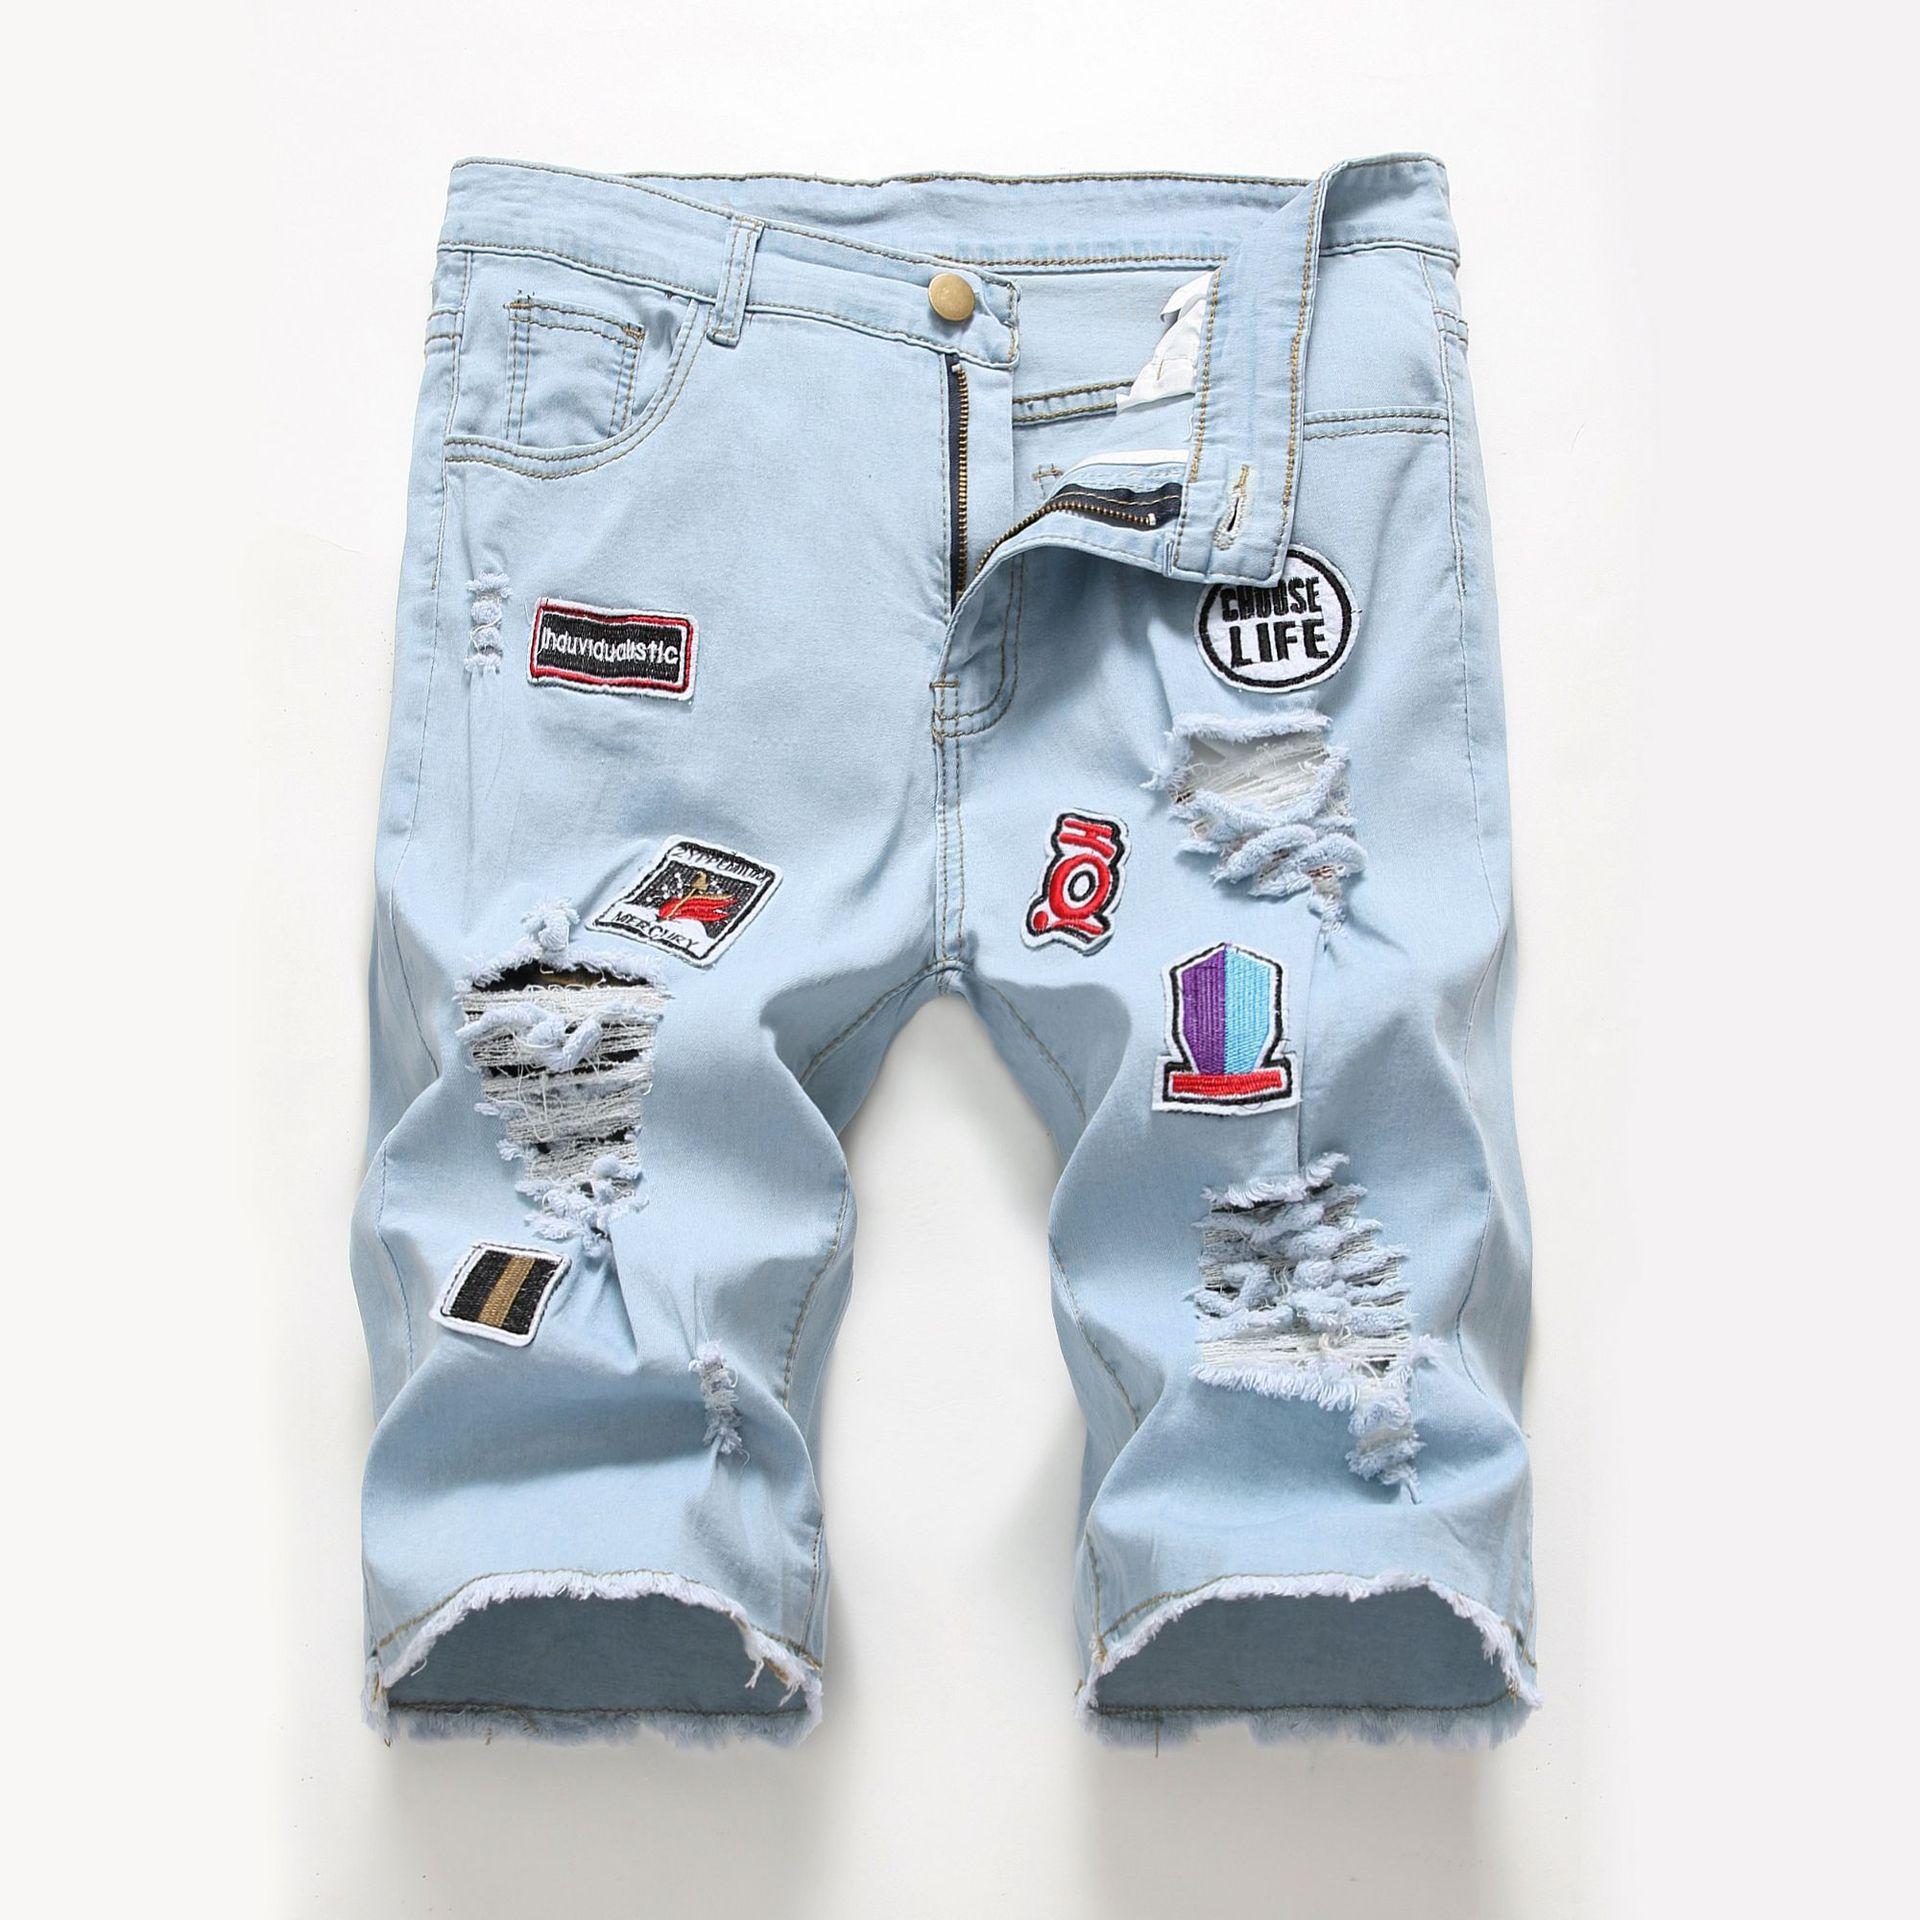 High Street Trend Cool Men'S Wear Fashion Popular High Street Hole Patch Ripped Jeans Elastic Denim Shorts